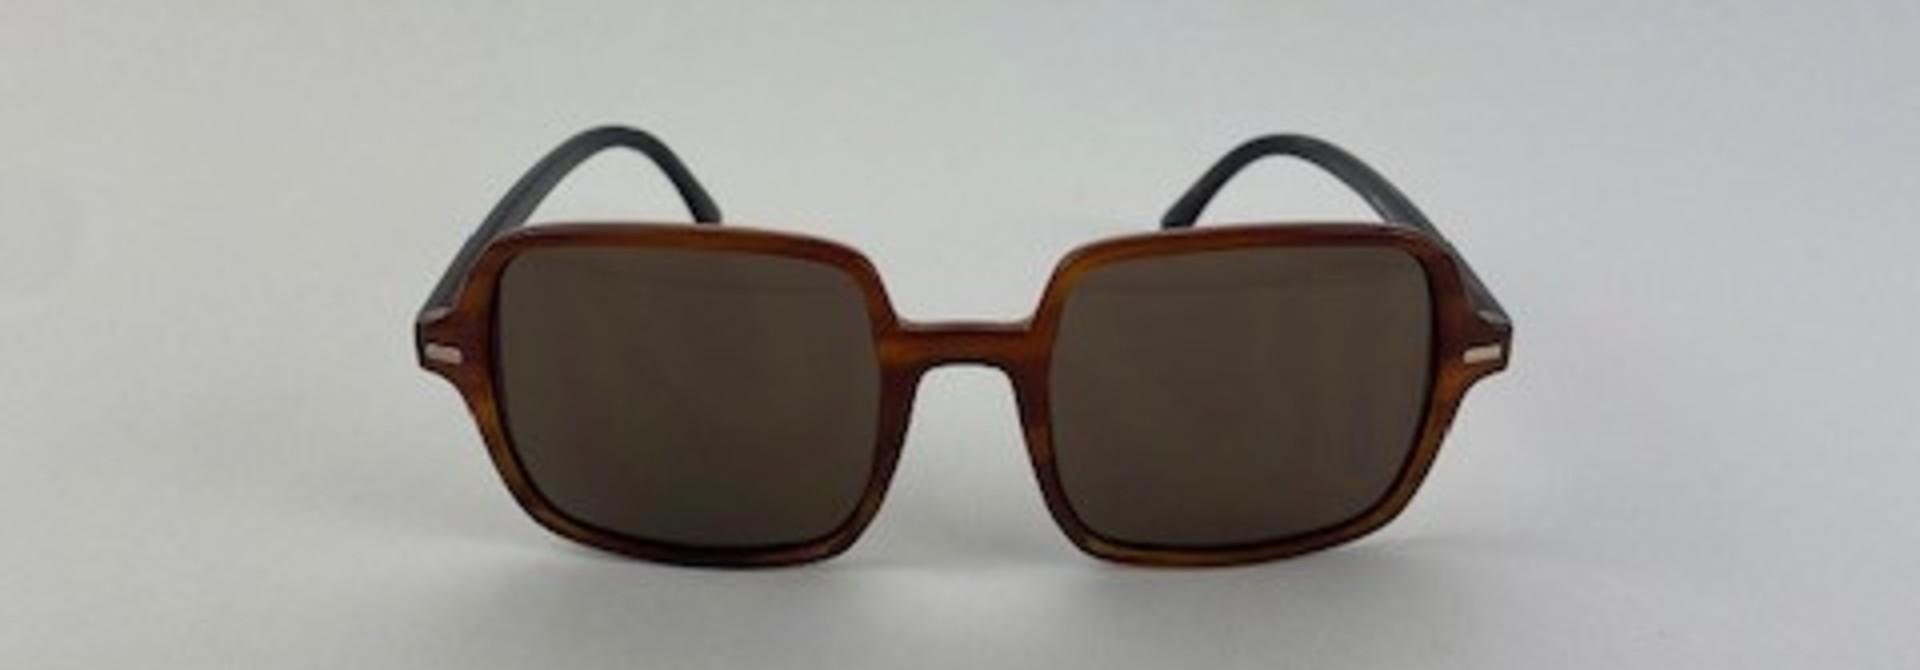 Malick sunglasses Caramel